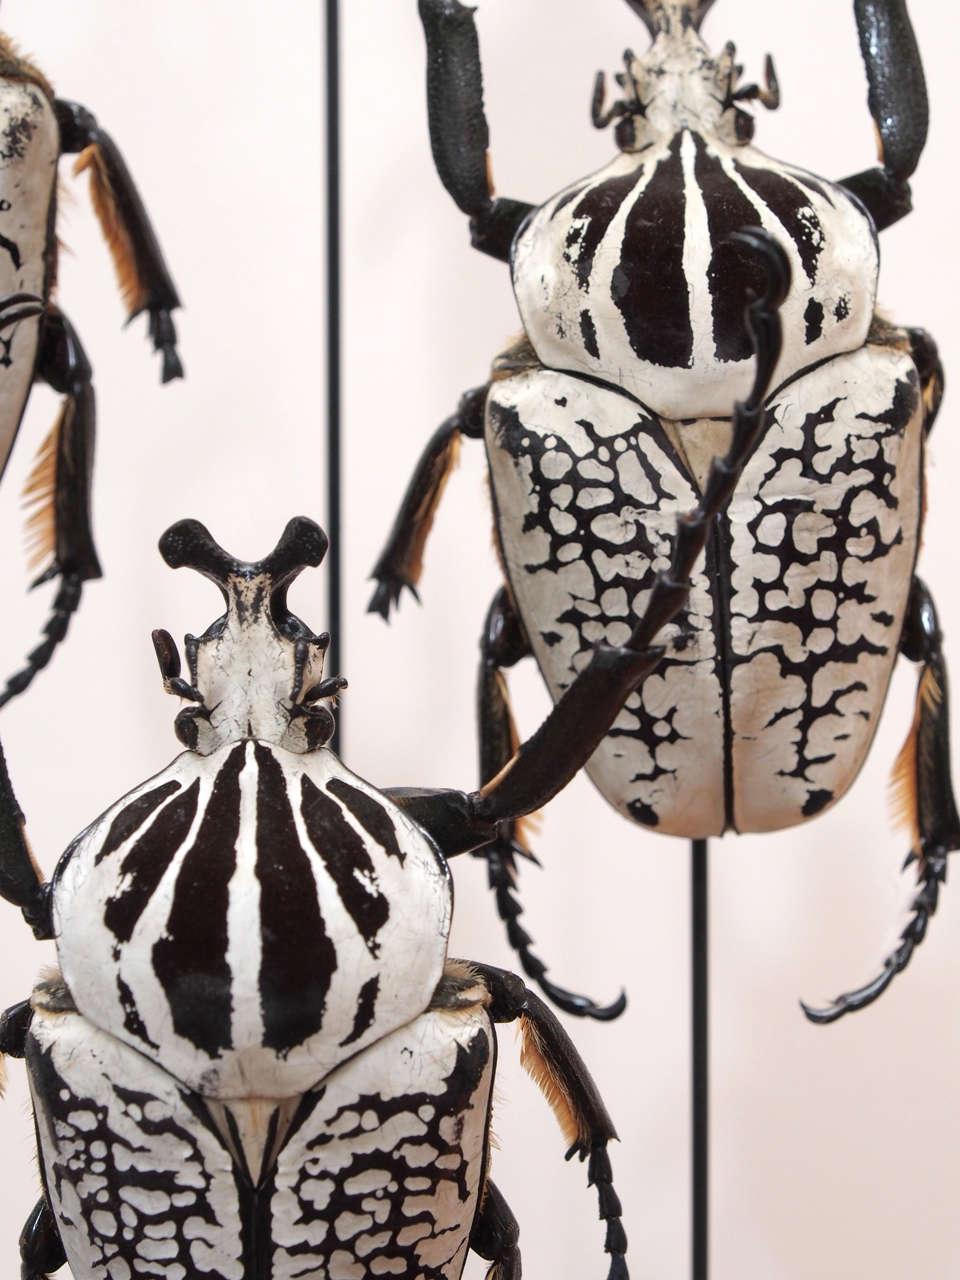 Specimen Beetles Under Glass Dome 4